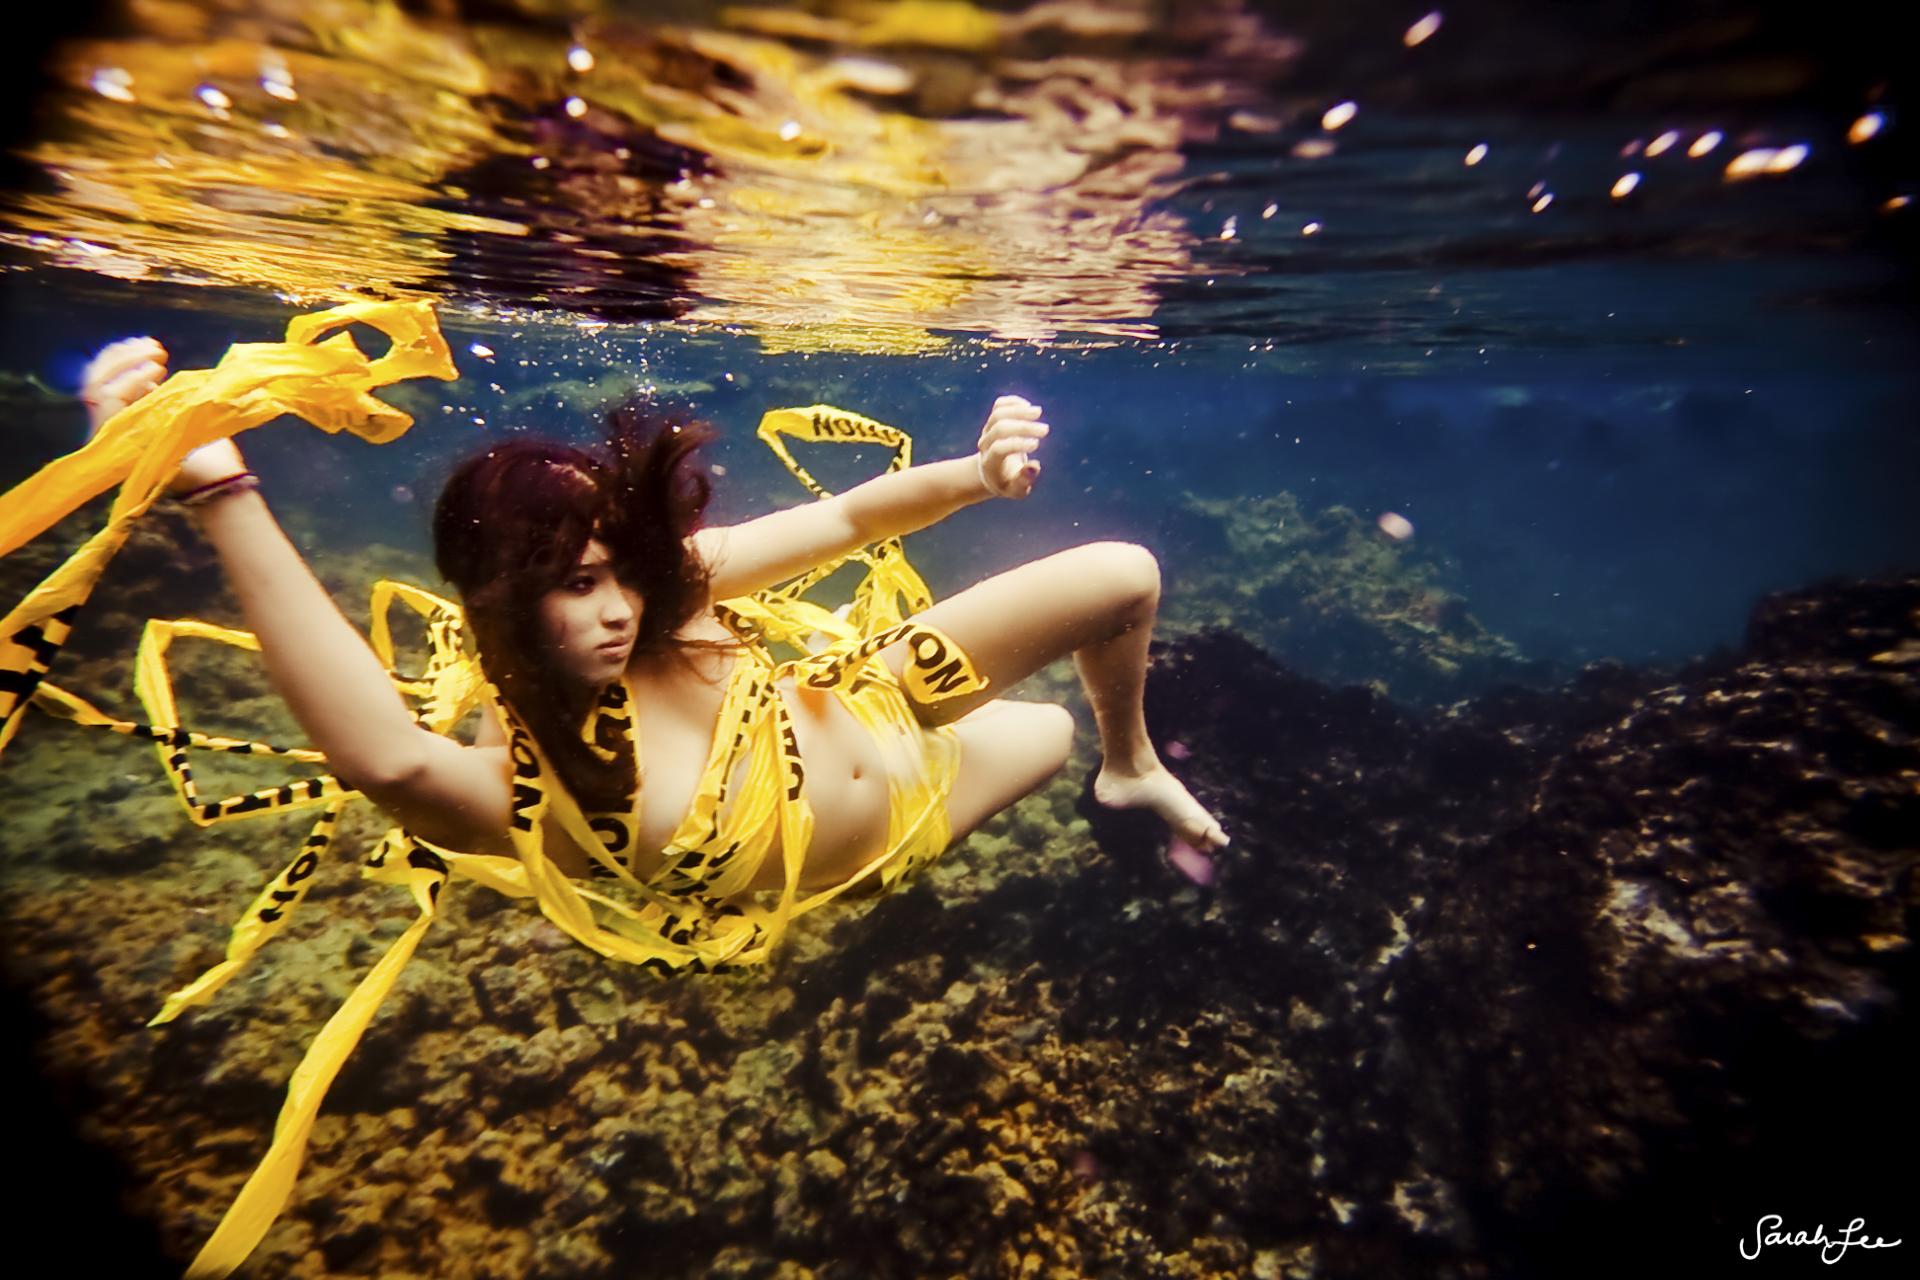 001_Sarah_Lee_Photography_Underwater_023.jpg